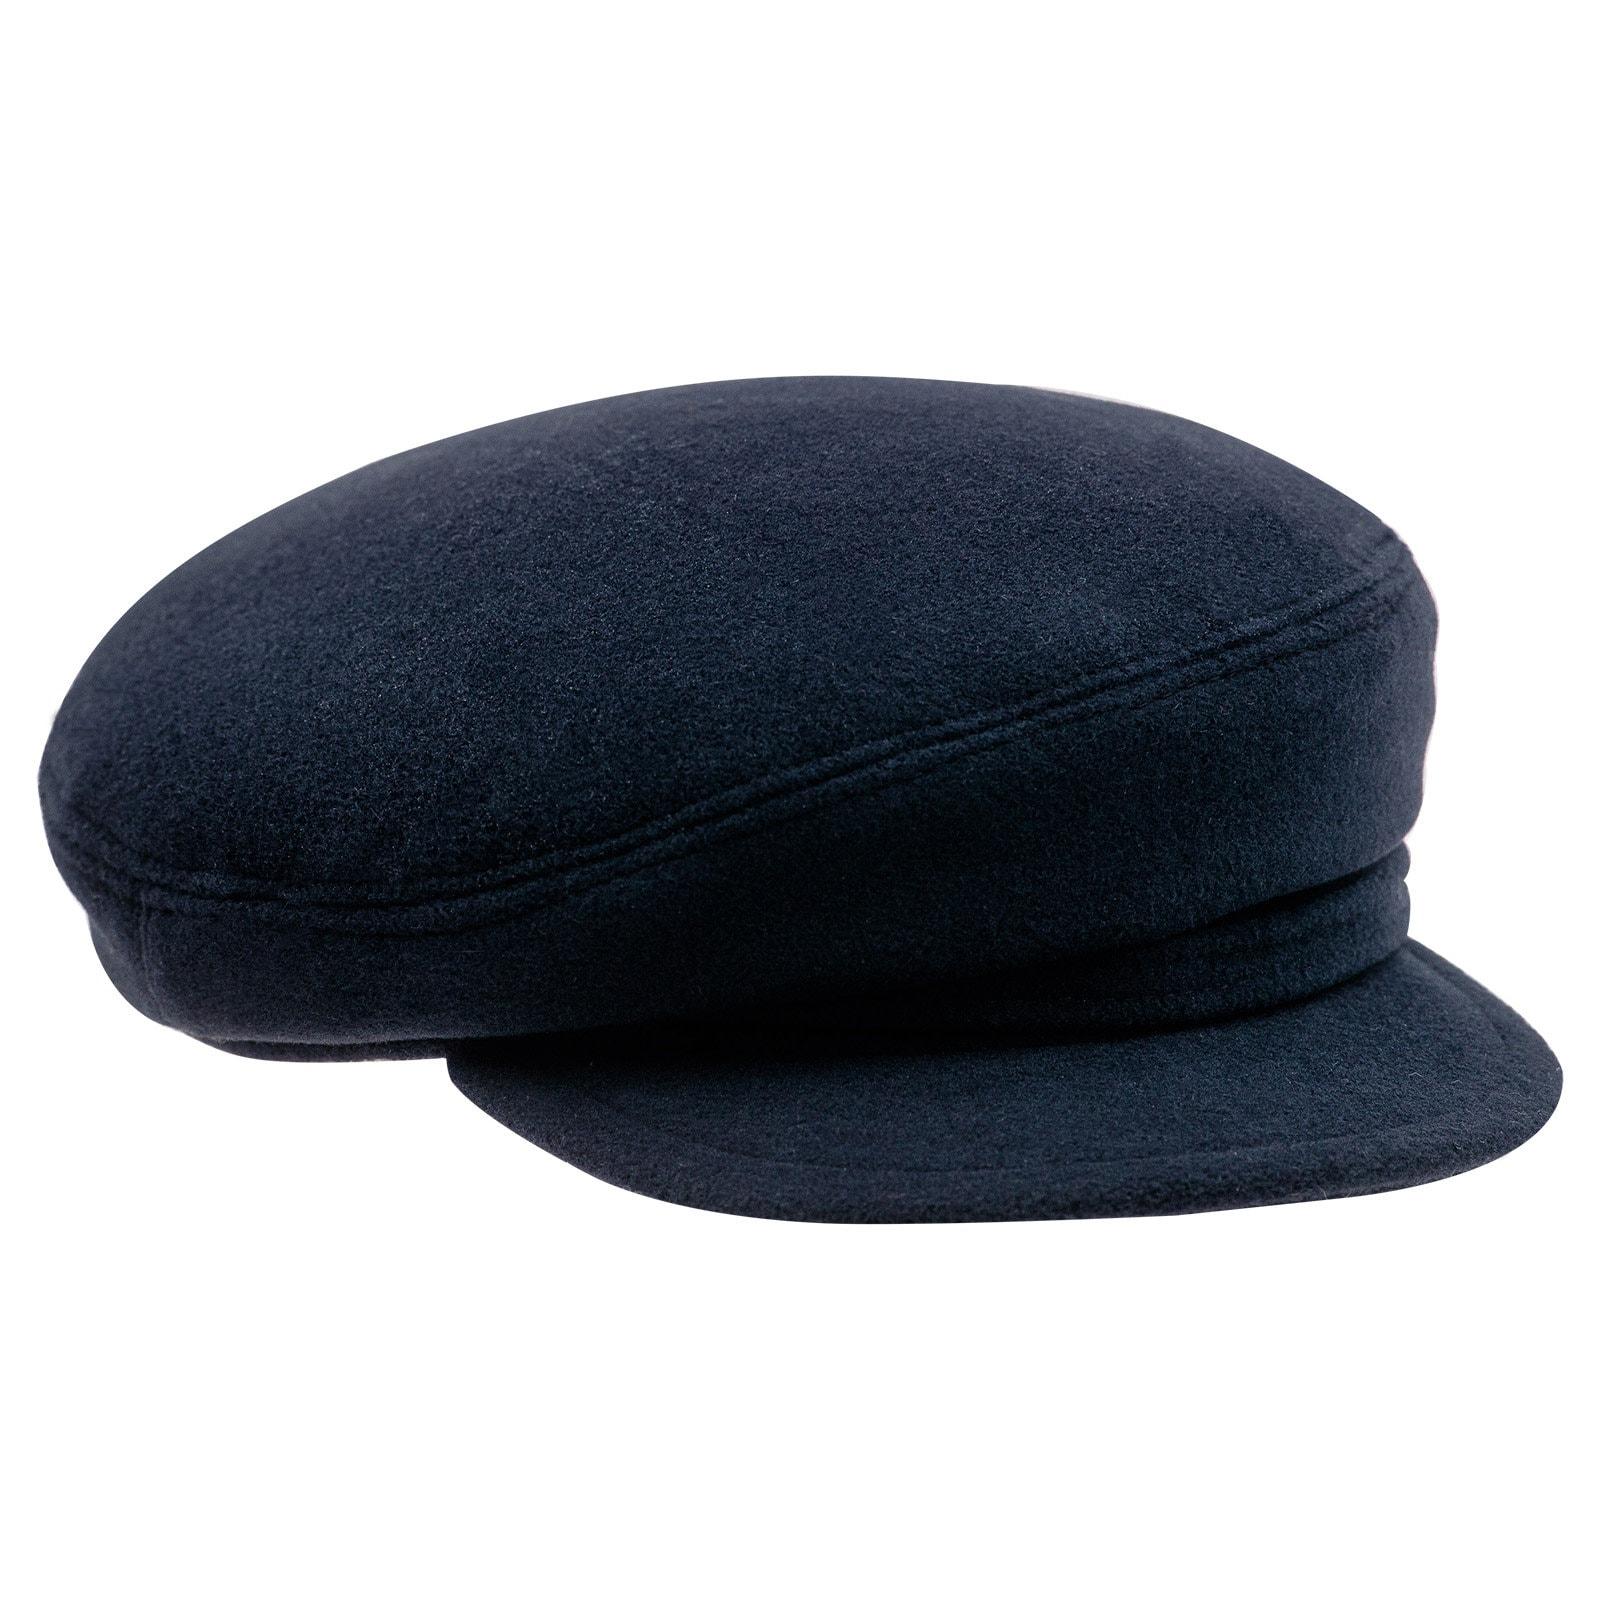 PIREUS Greek Fisherman   Breton style Cap made of Soft and  7711f1262f52